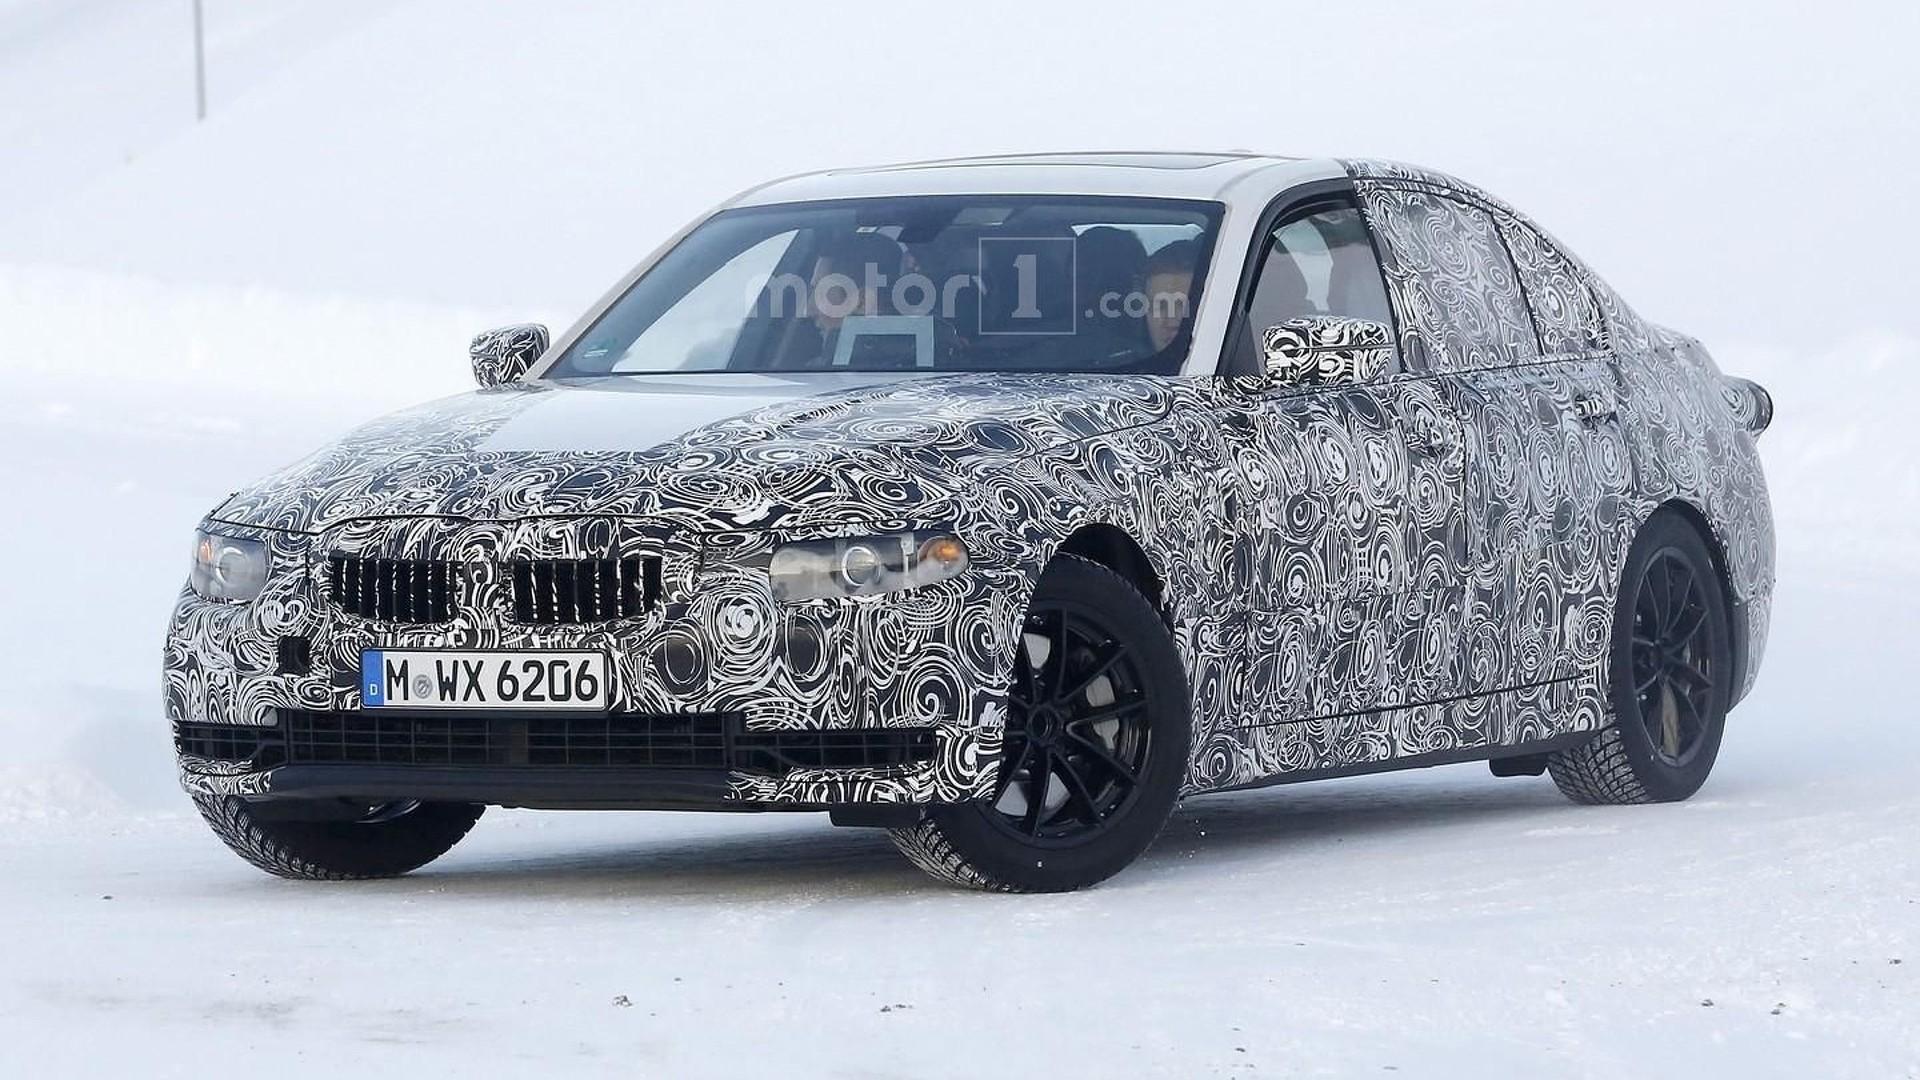 2018 BMW 3 Series says hello from Scandinavia | Motor1.com